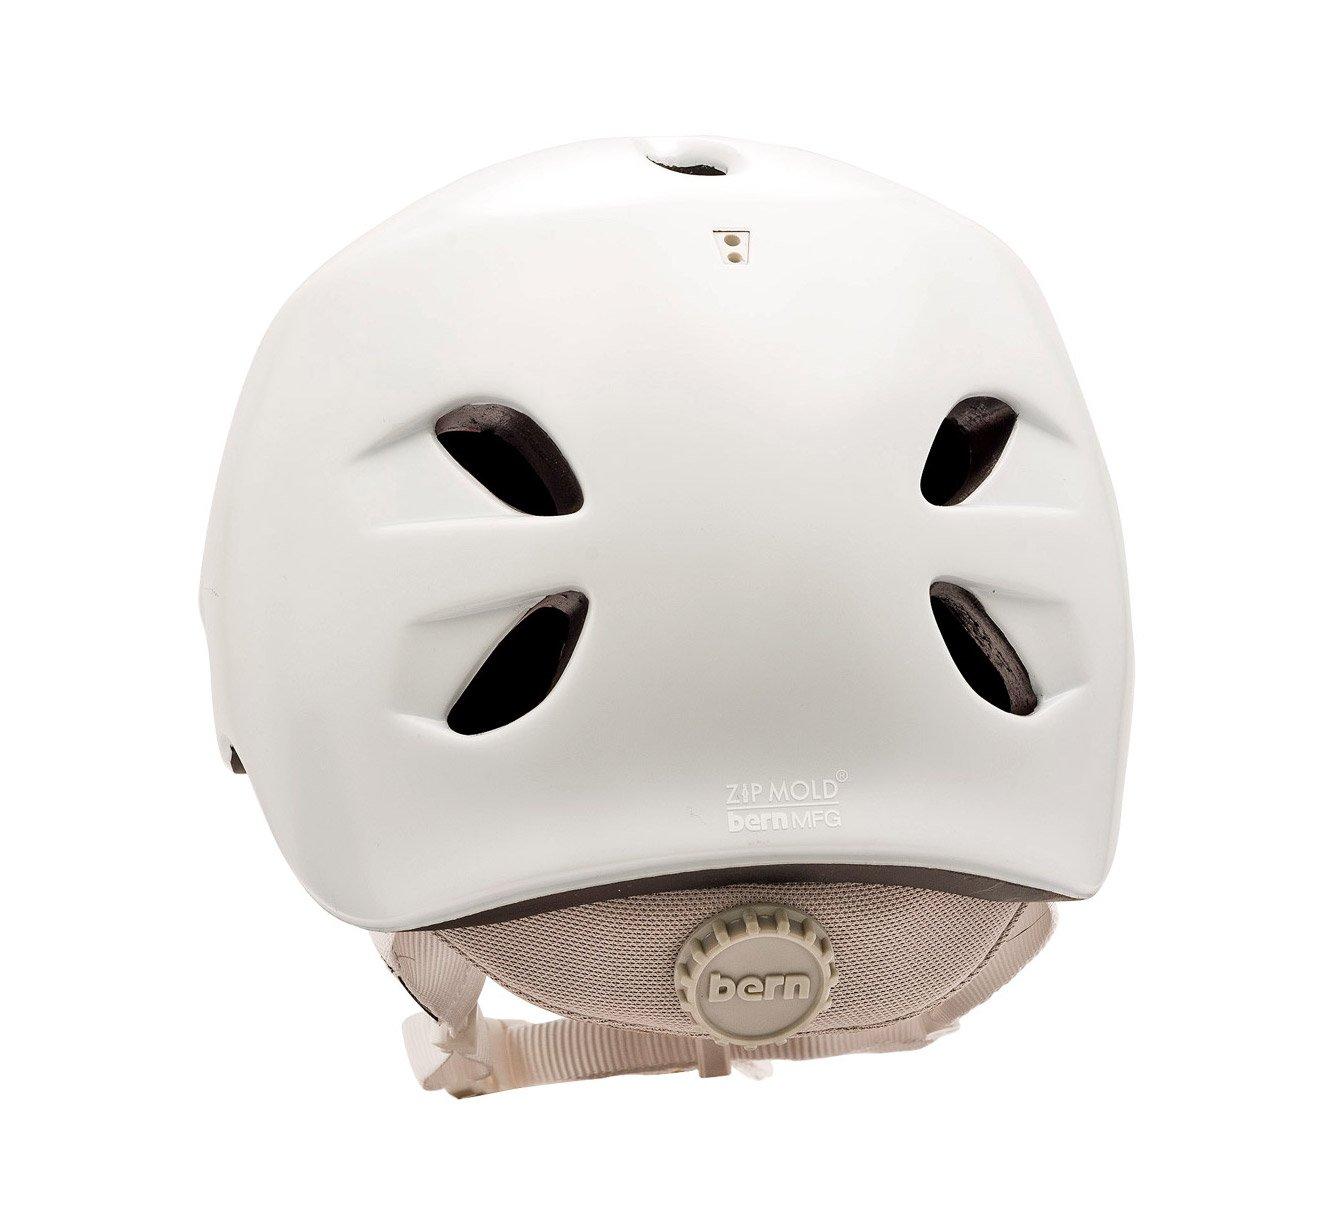 Bern Berkeley MSRP Half Shell - Cascos para Bicicleta (Hard Shell, Fijo, Mujer, Turquesa, Violeta, Color Blanco, Half Shell, CPSC, ASTM F 2040, ...